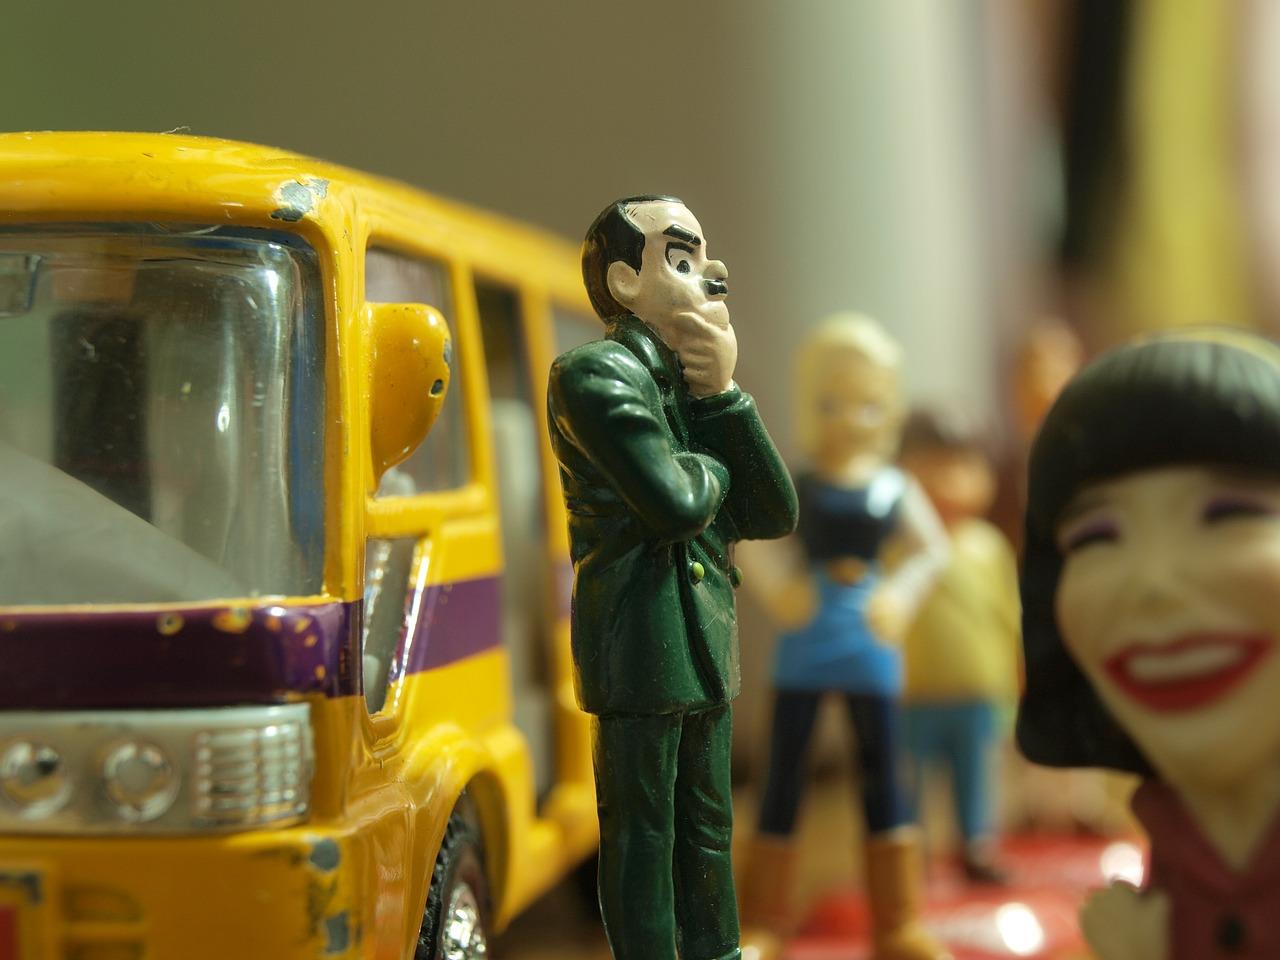 bus-stop-391242_1280